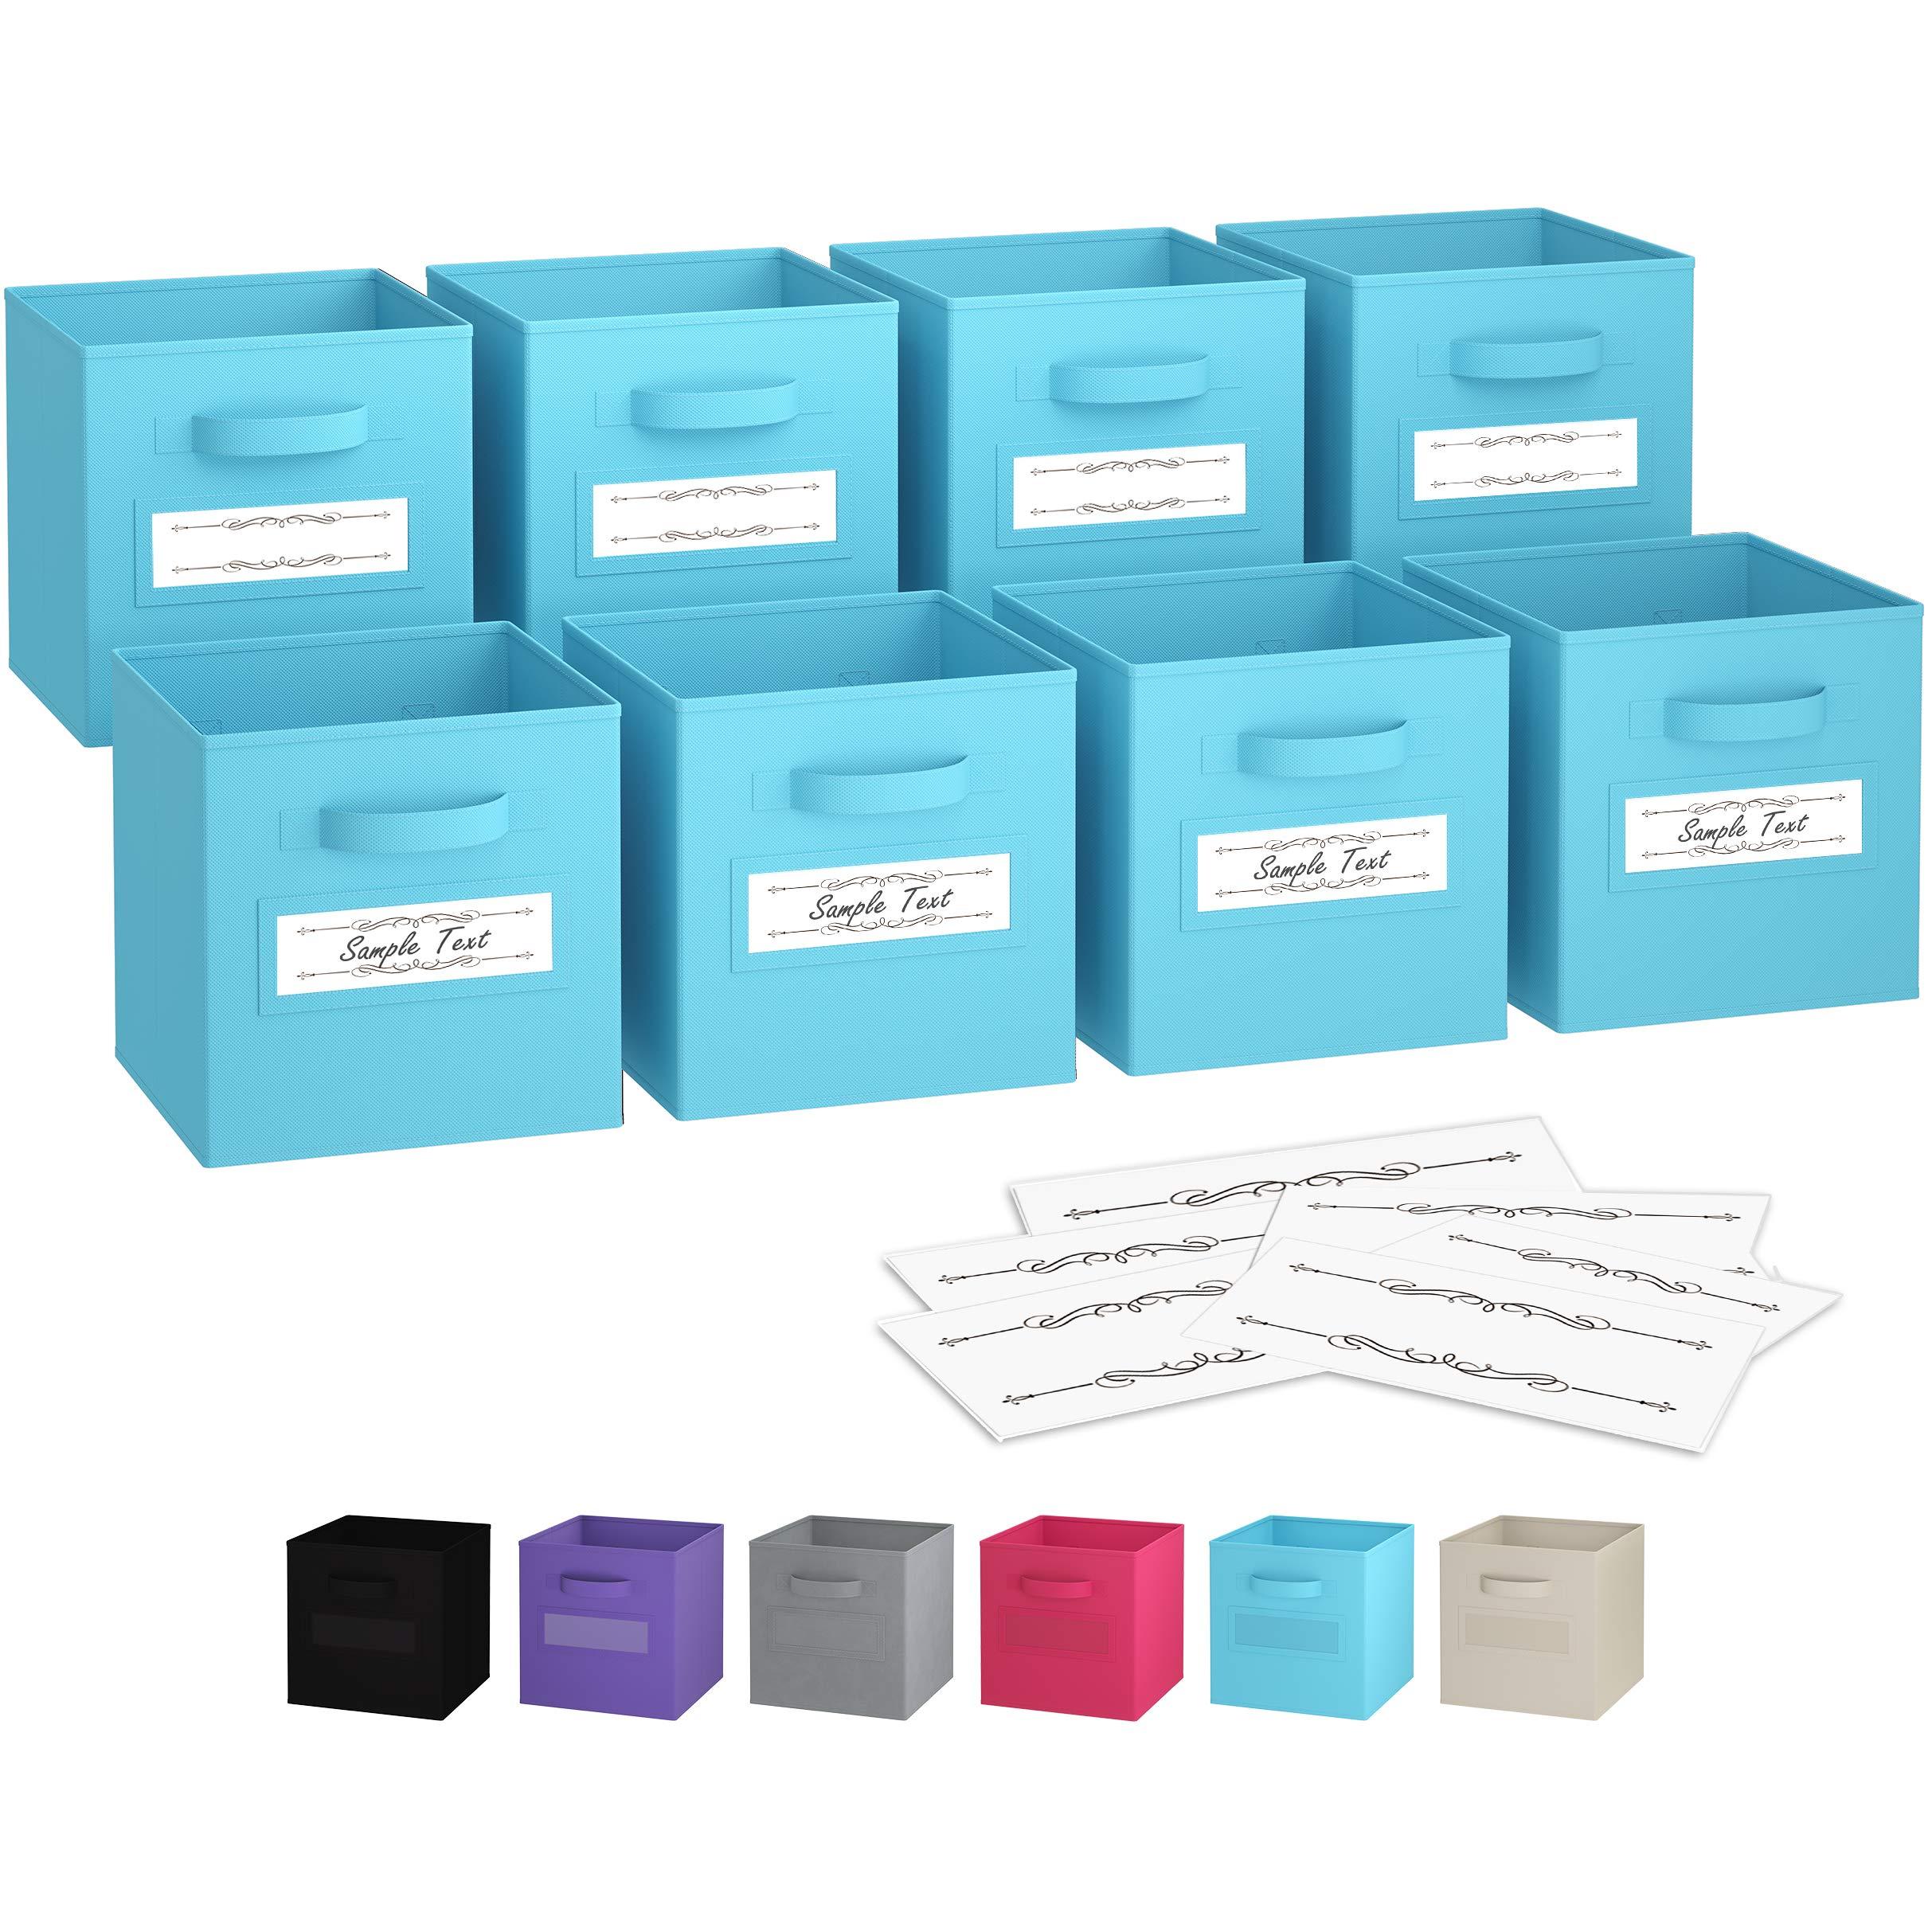 Royexe - Storage Cubes - (Set of 8) Storage Baskets | Features Dual Handles & 10 Label Window Cards | Cube Storage Bins | Foldable Fabric Closet Shelf Organizer | Drawer Organizers and Storage (Blue)